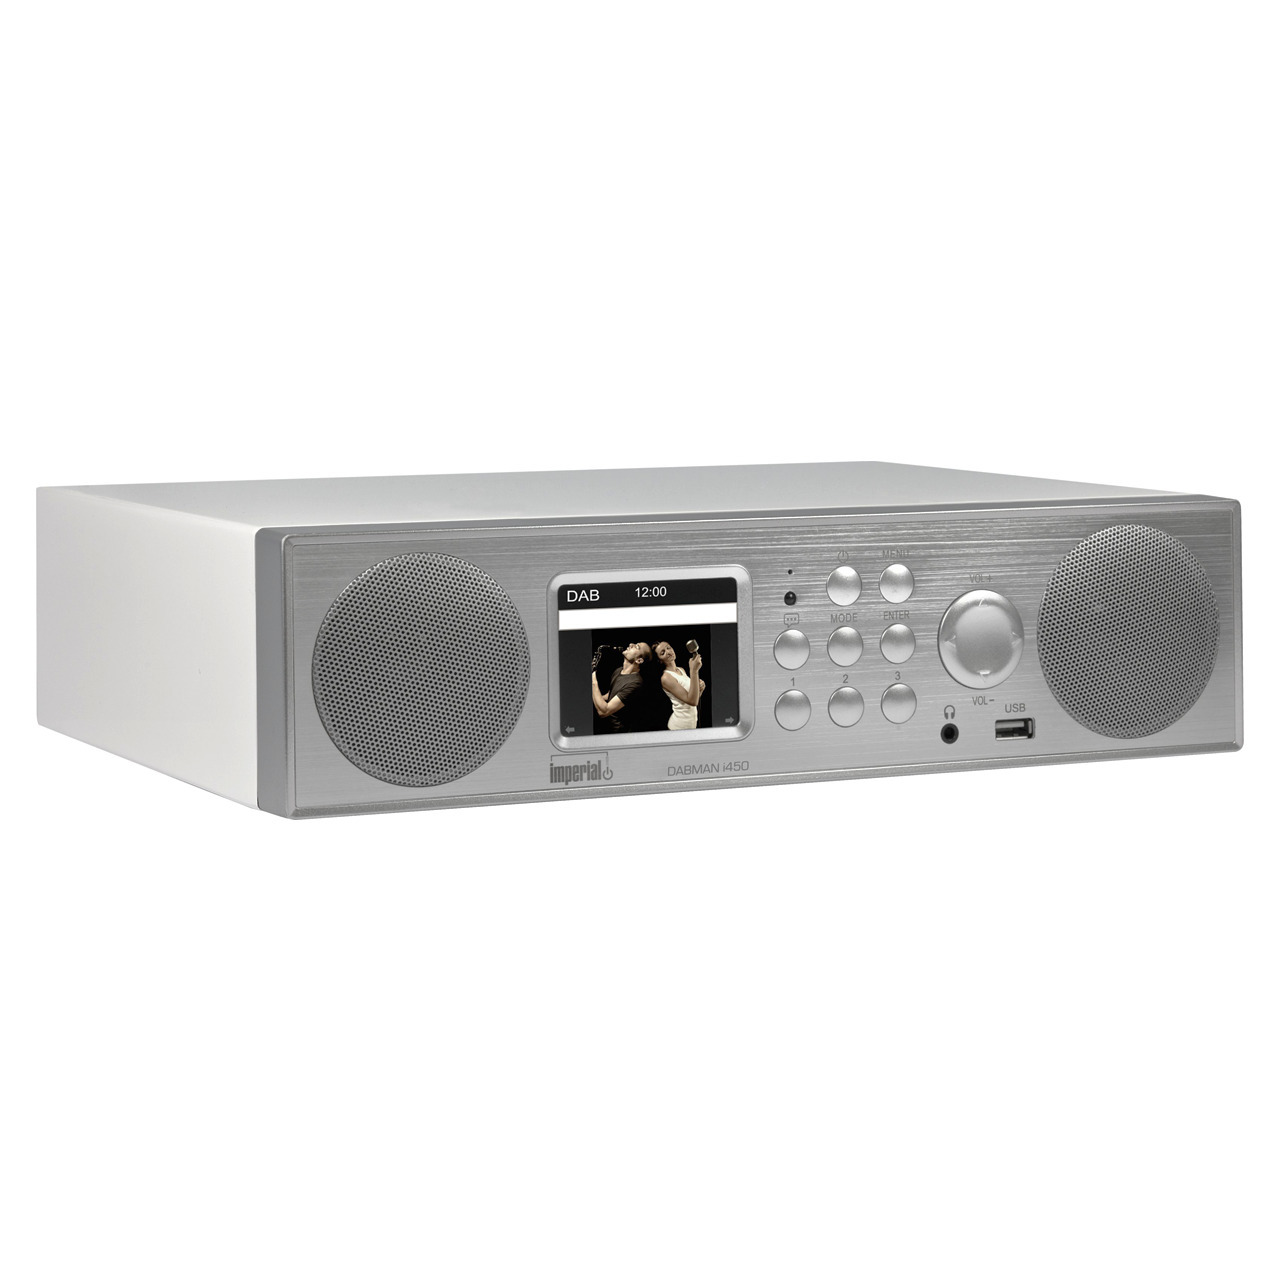 Imperial Hybrid-Küchen-Tischradio Dabman i450- UKW-DAB+-Internet- DLNA- Bluetooth- USB